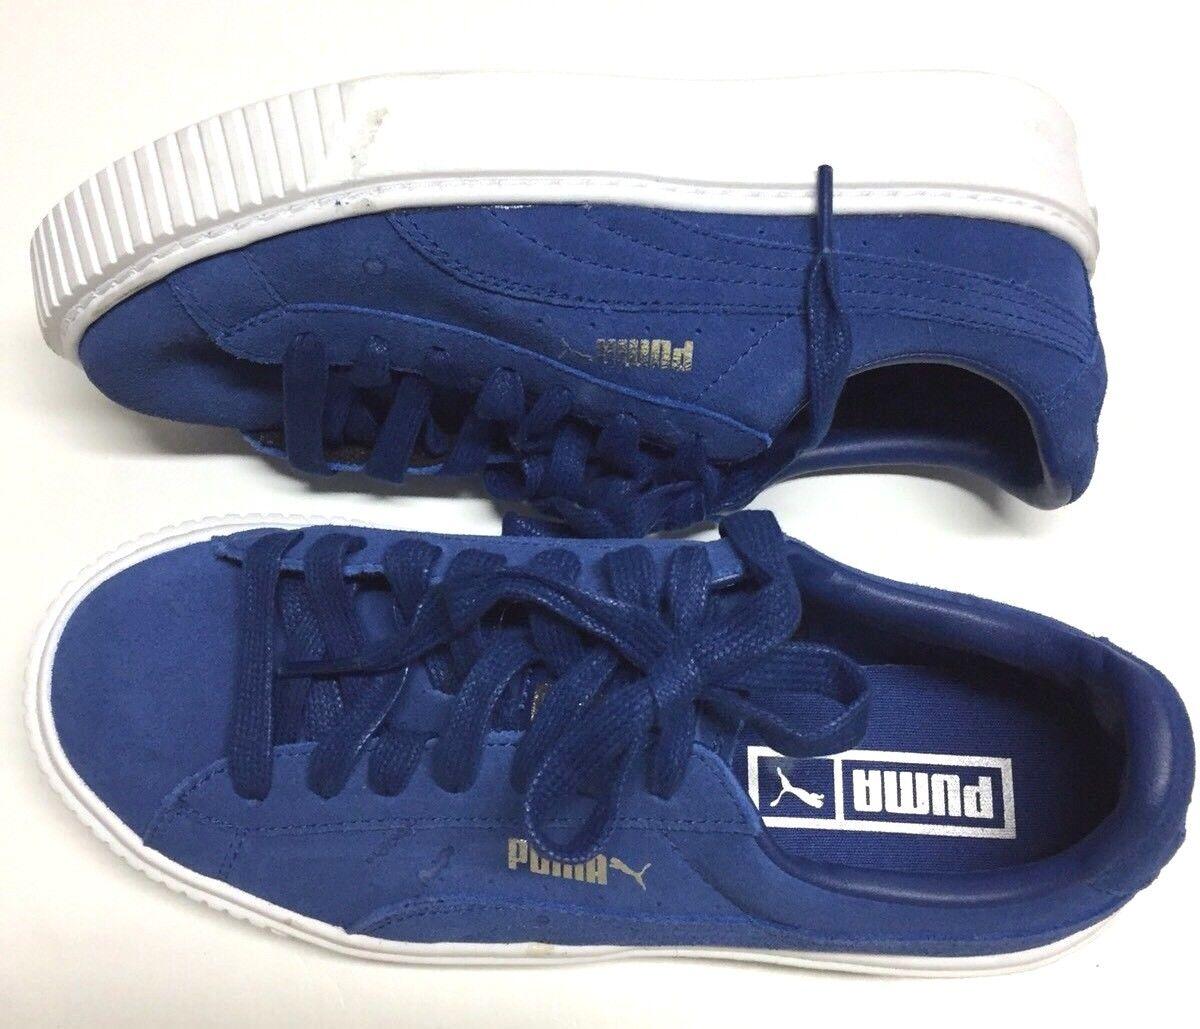 Puma Women's Suede Platform 36222302 Peacoat White Casual Casual Casual shoes Medium 6.5 US 49ec18